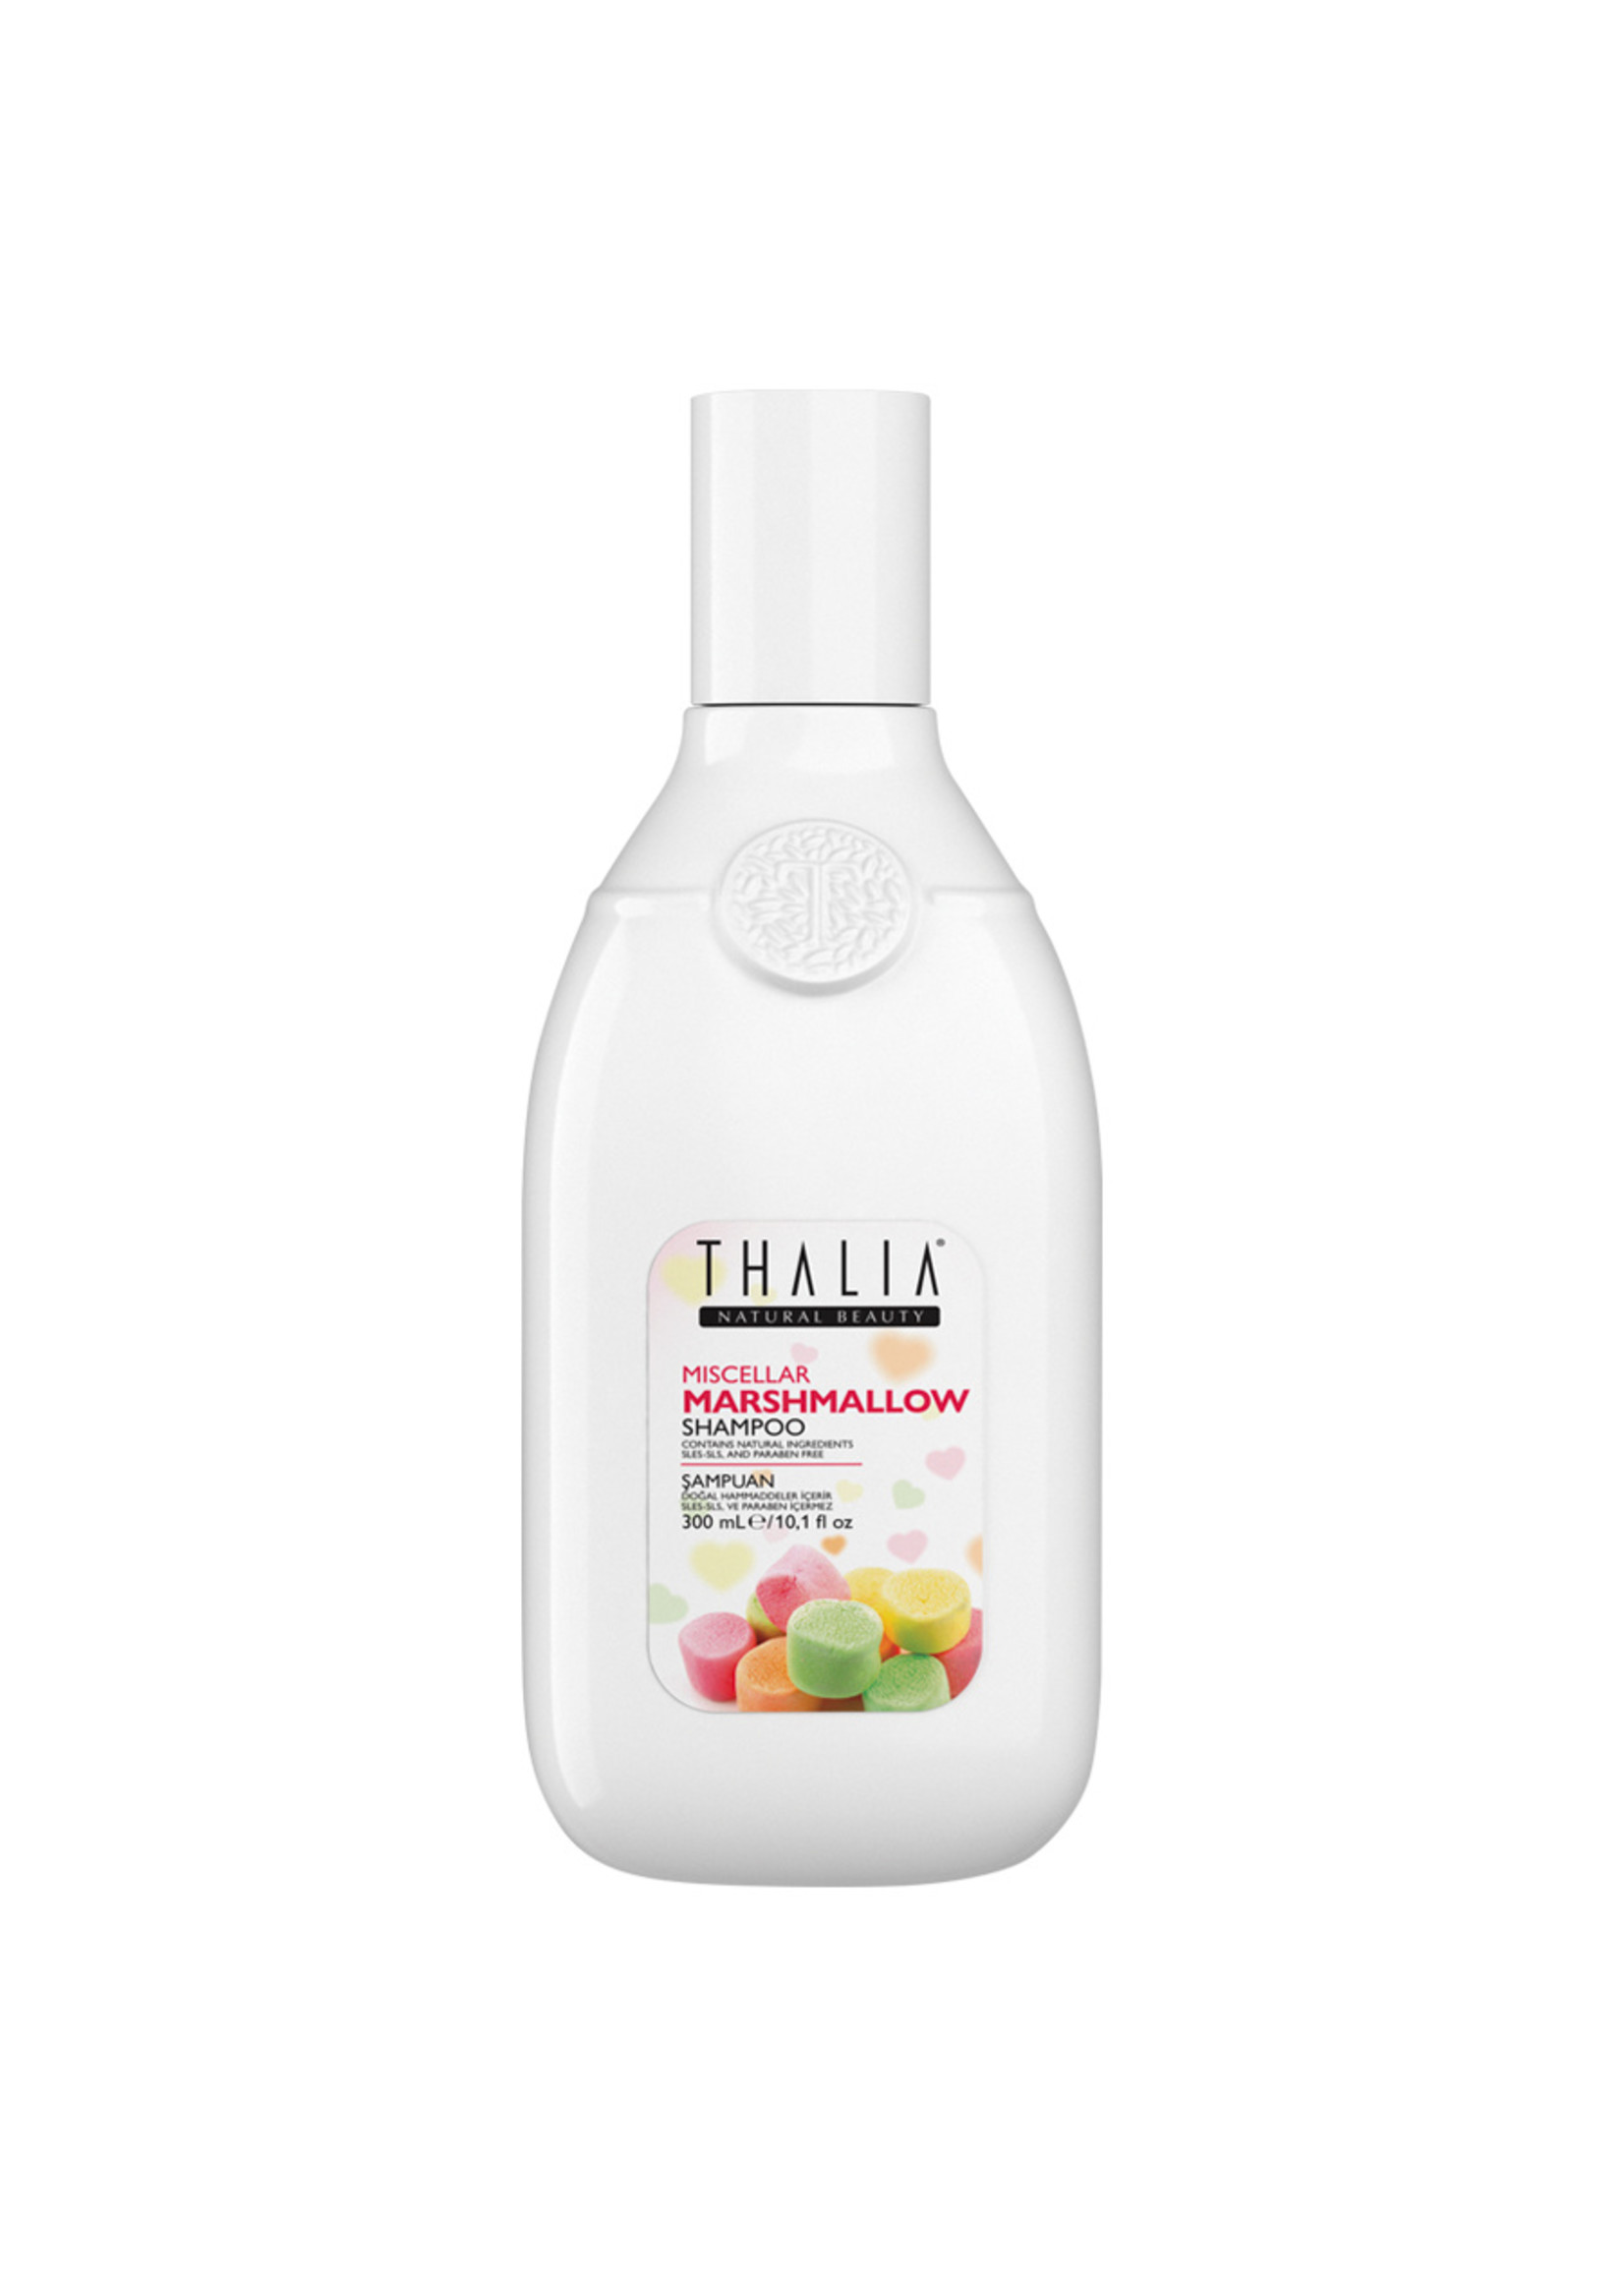 Thalia Marshmallow Shampoo 300 ml